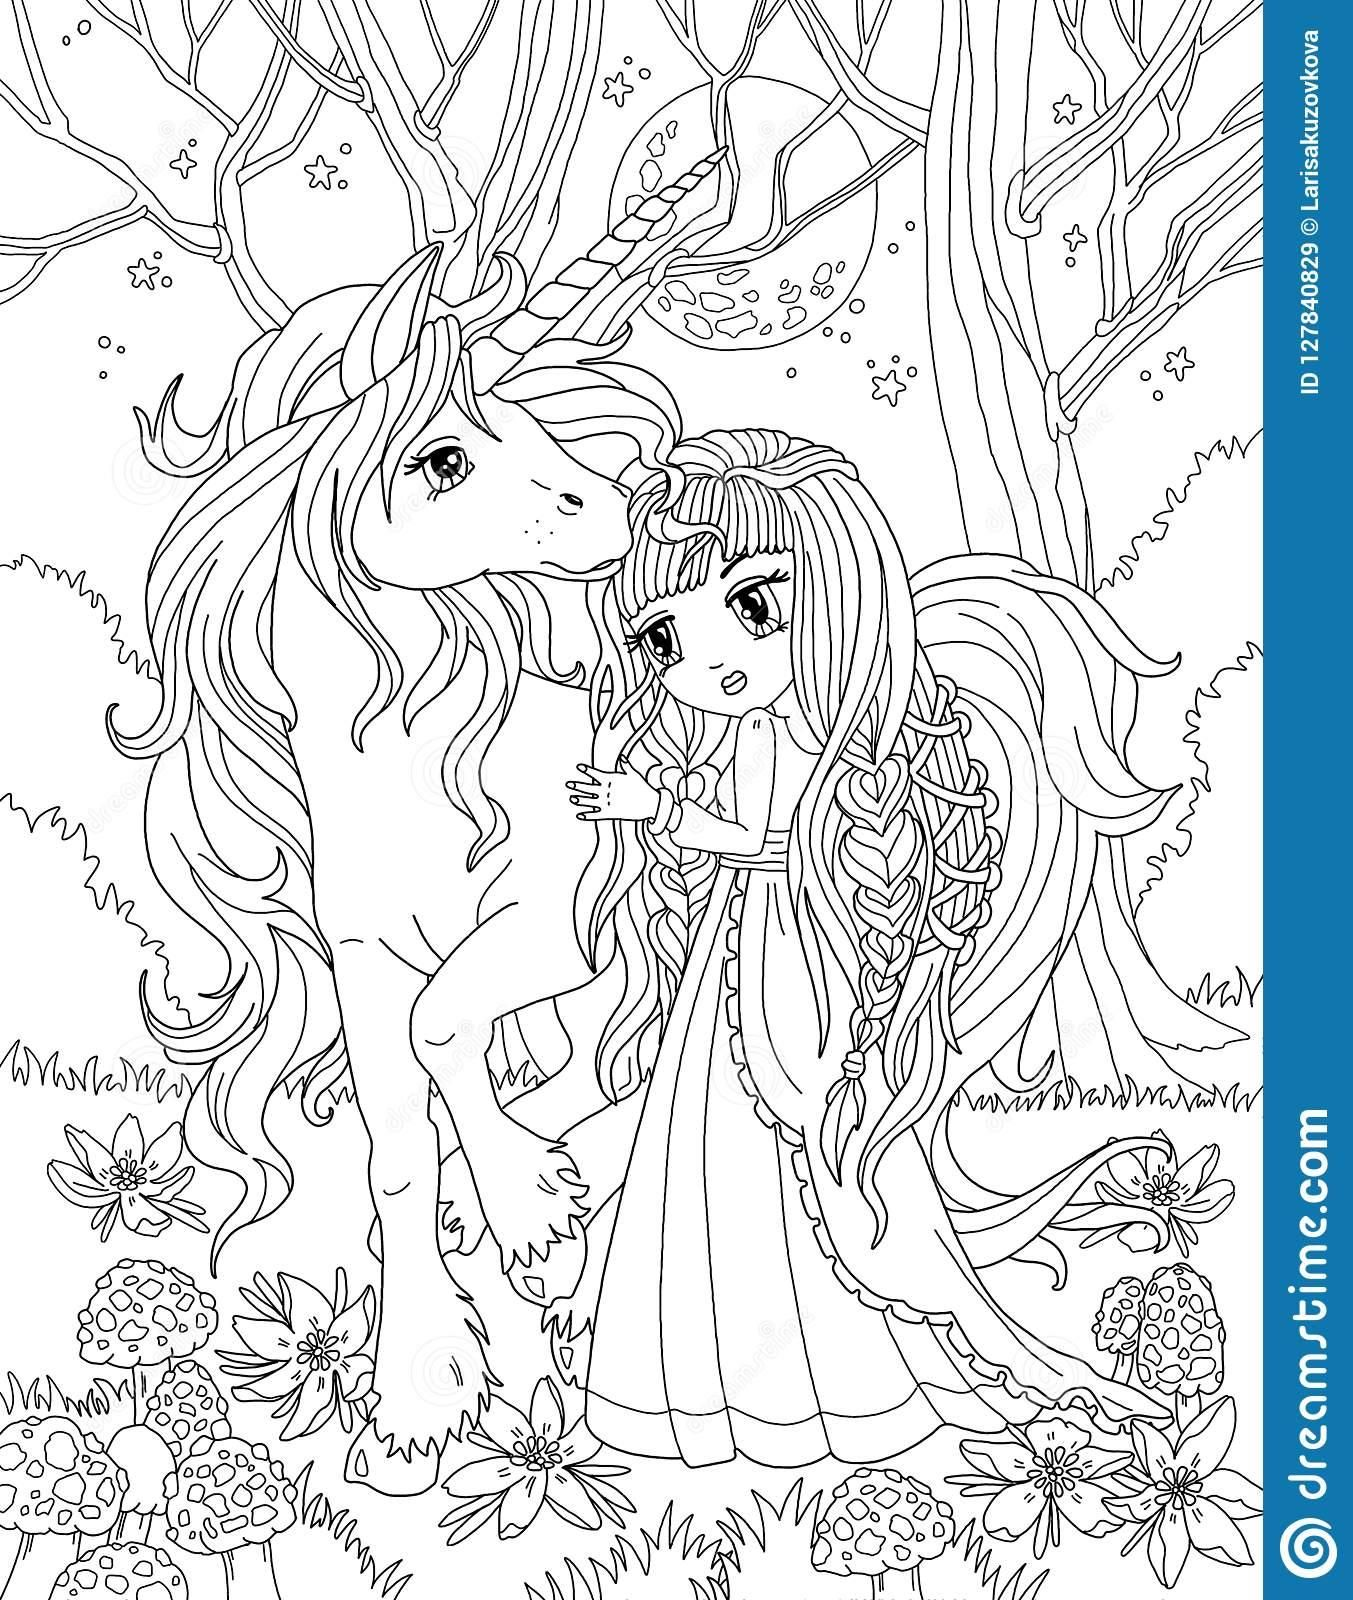 16 Coloring Page Unicorn Princess In 2020 Unicorn Coloring Pages Princess Coloring Pages Princess Coloring